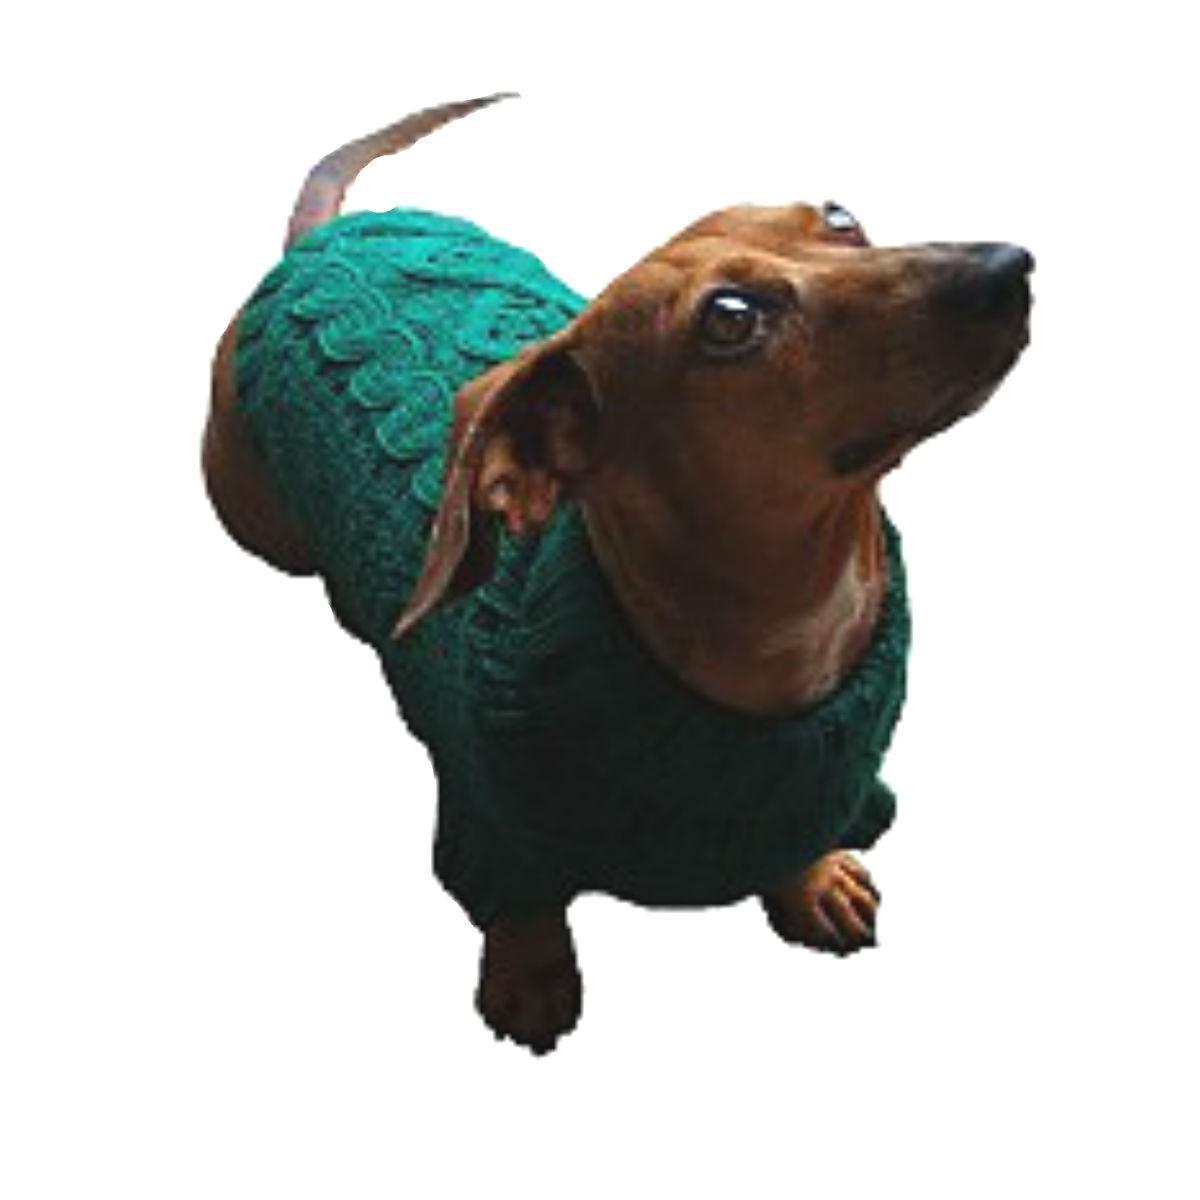 Dallas Dogs Irish Knit Dog Sweater - Hunter Green